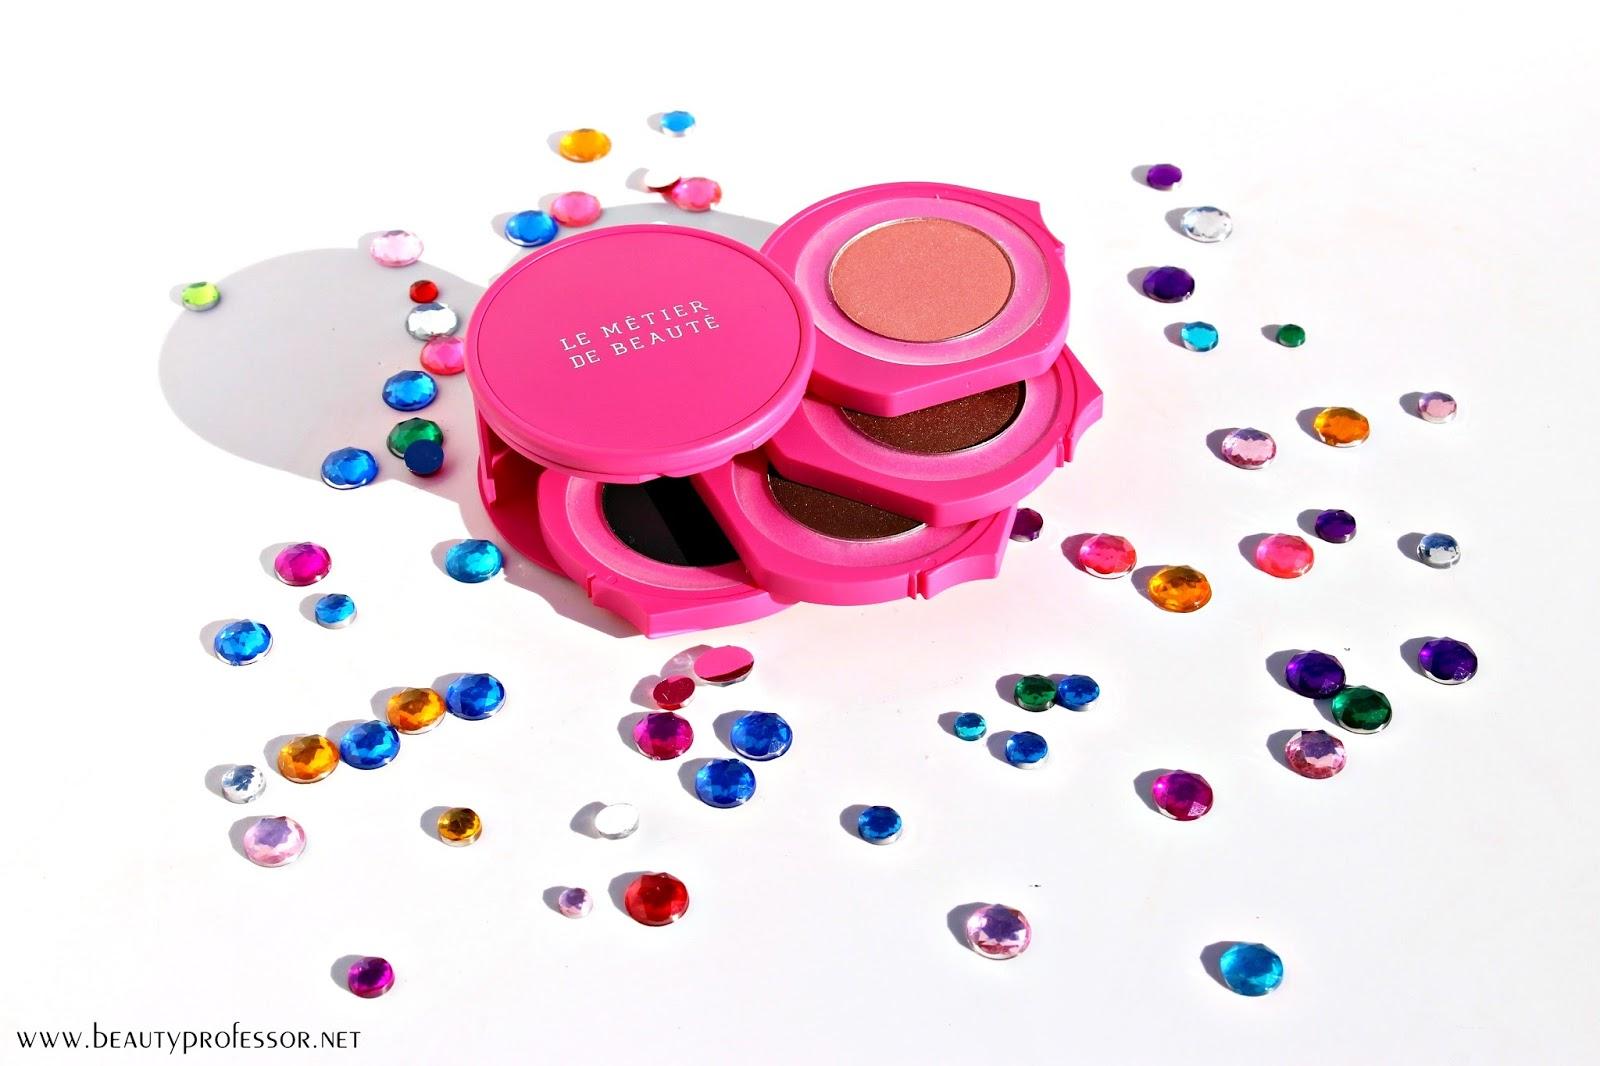 90c46d25f4bd4 First Look: The Le Metier de Beaute Faces of Beauty Kaleidoscope + ...